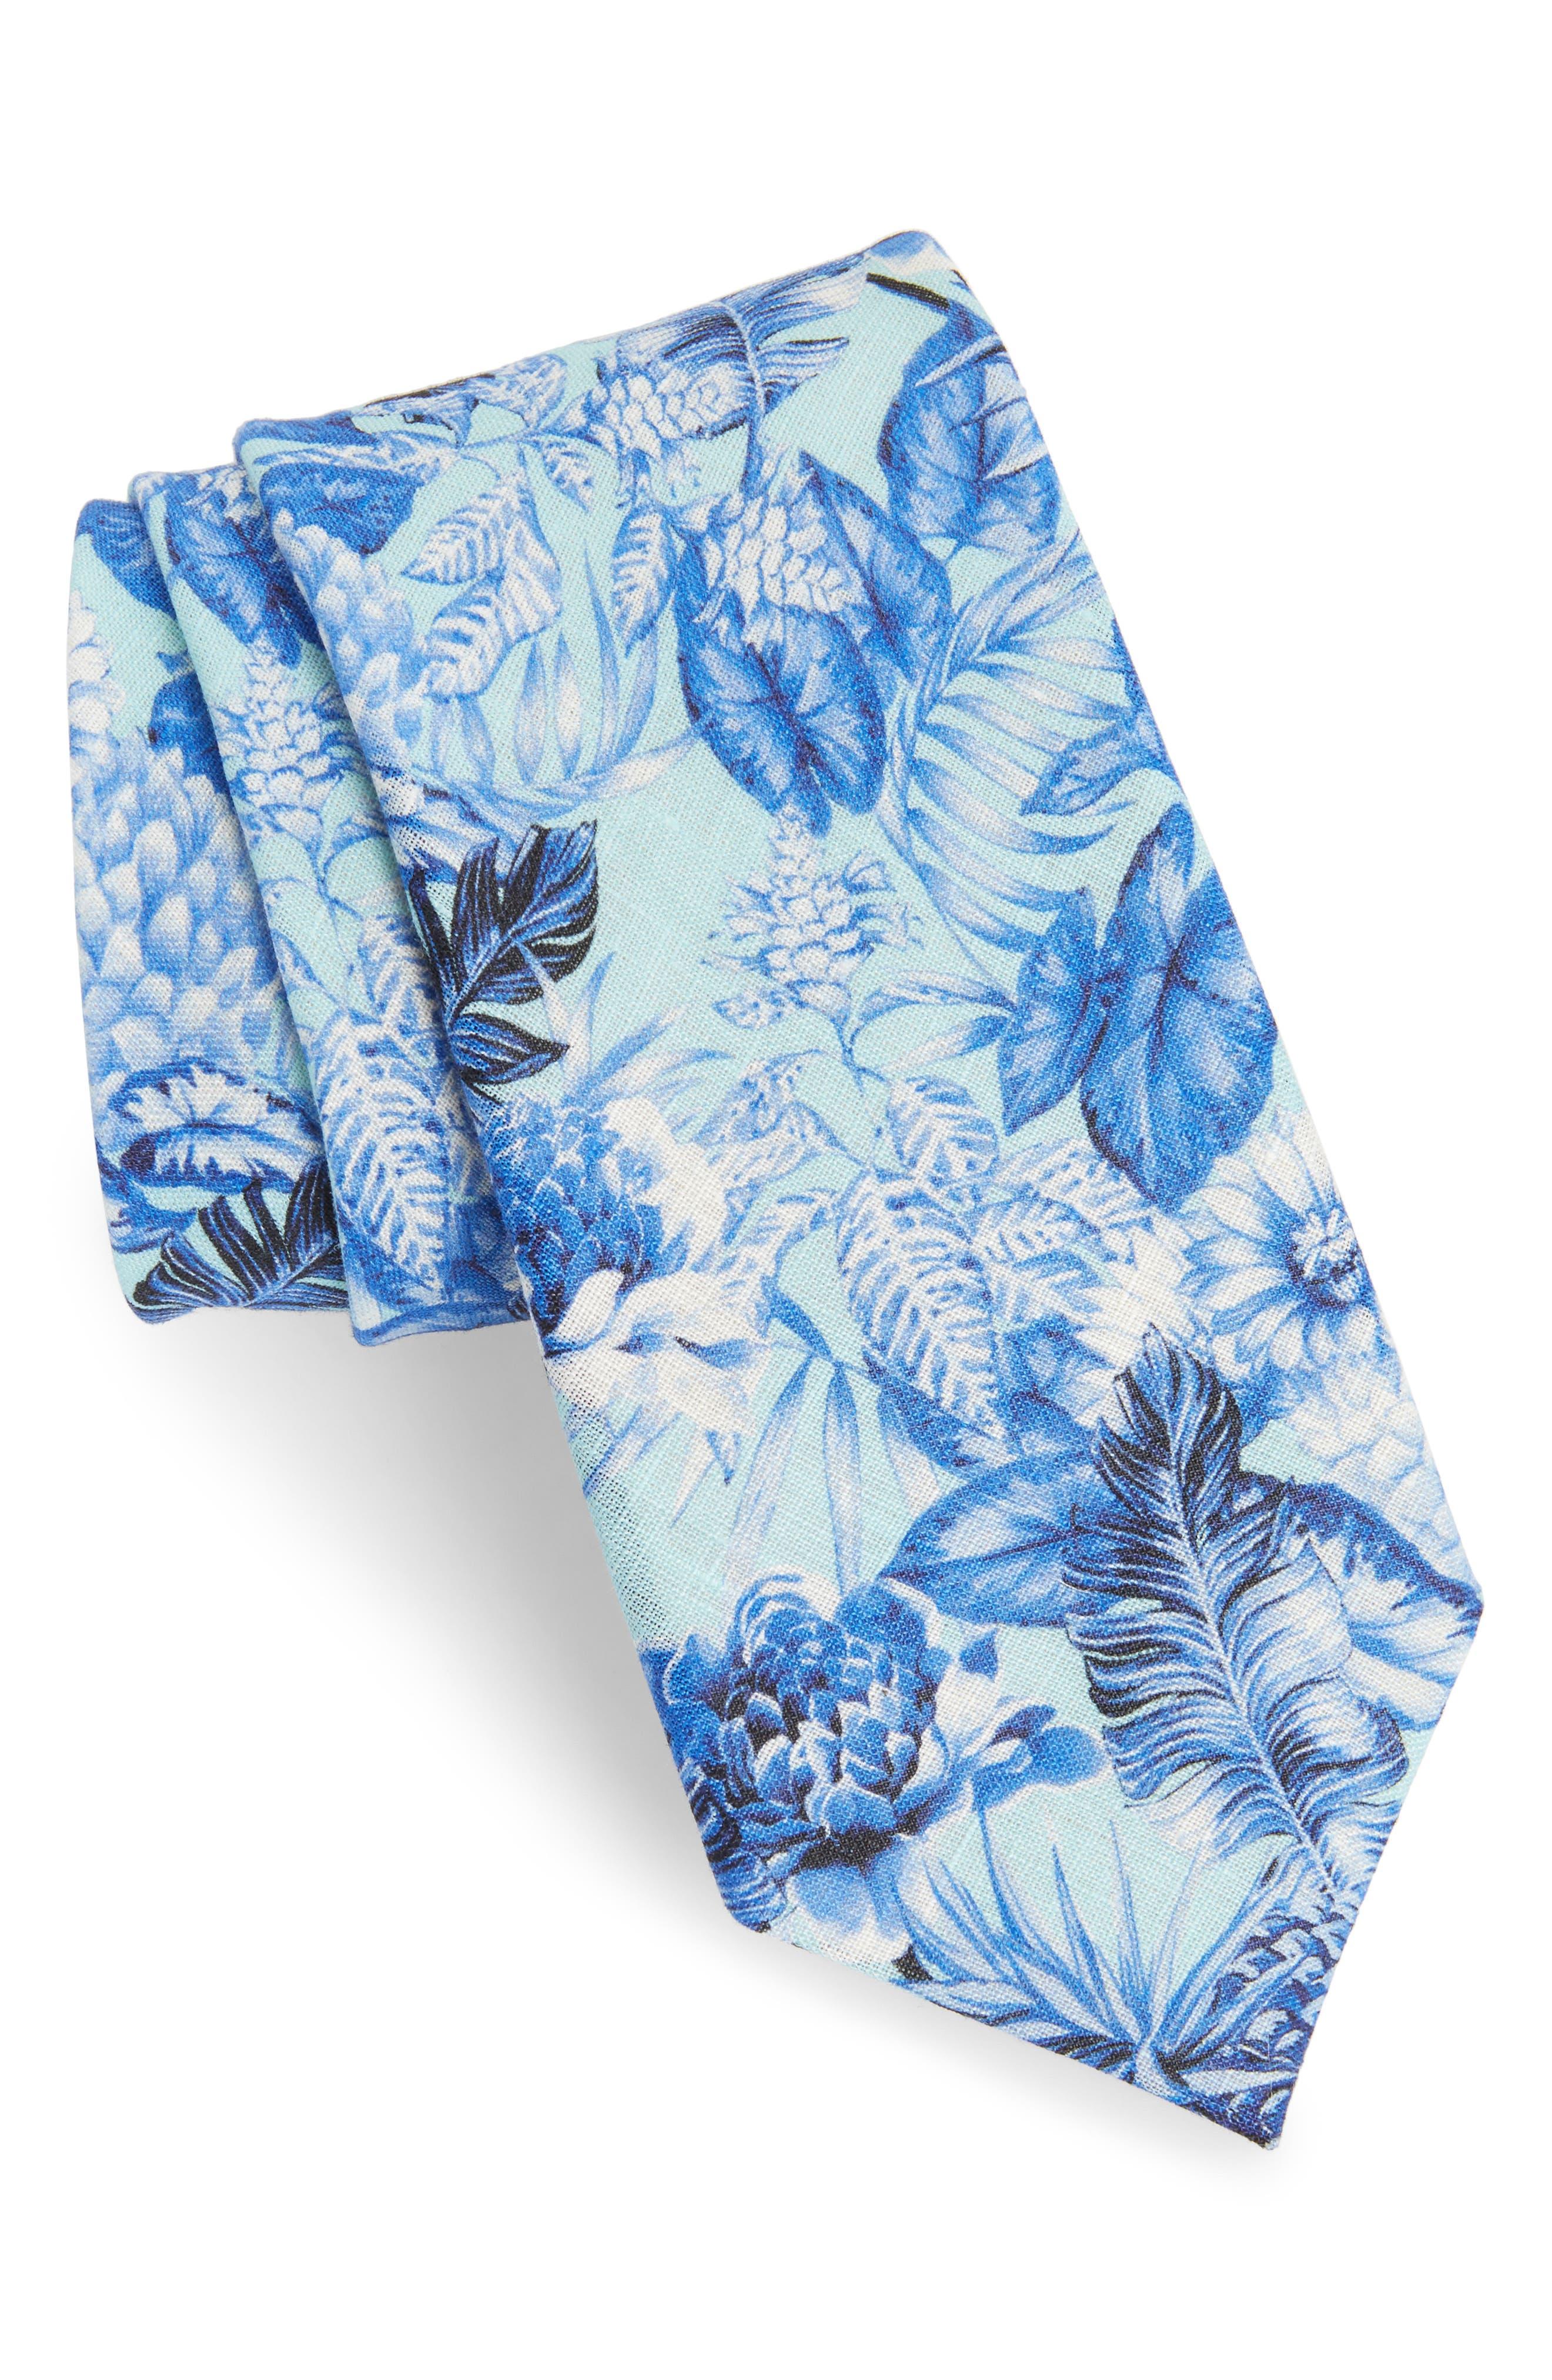 Tropic Fever Linen Tie,                         Main,                         color, 400